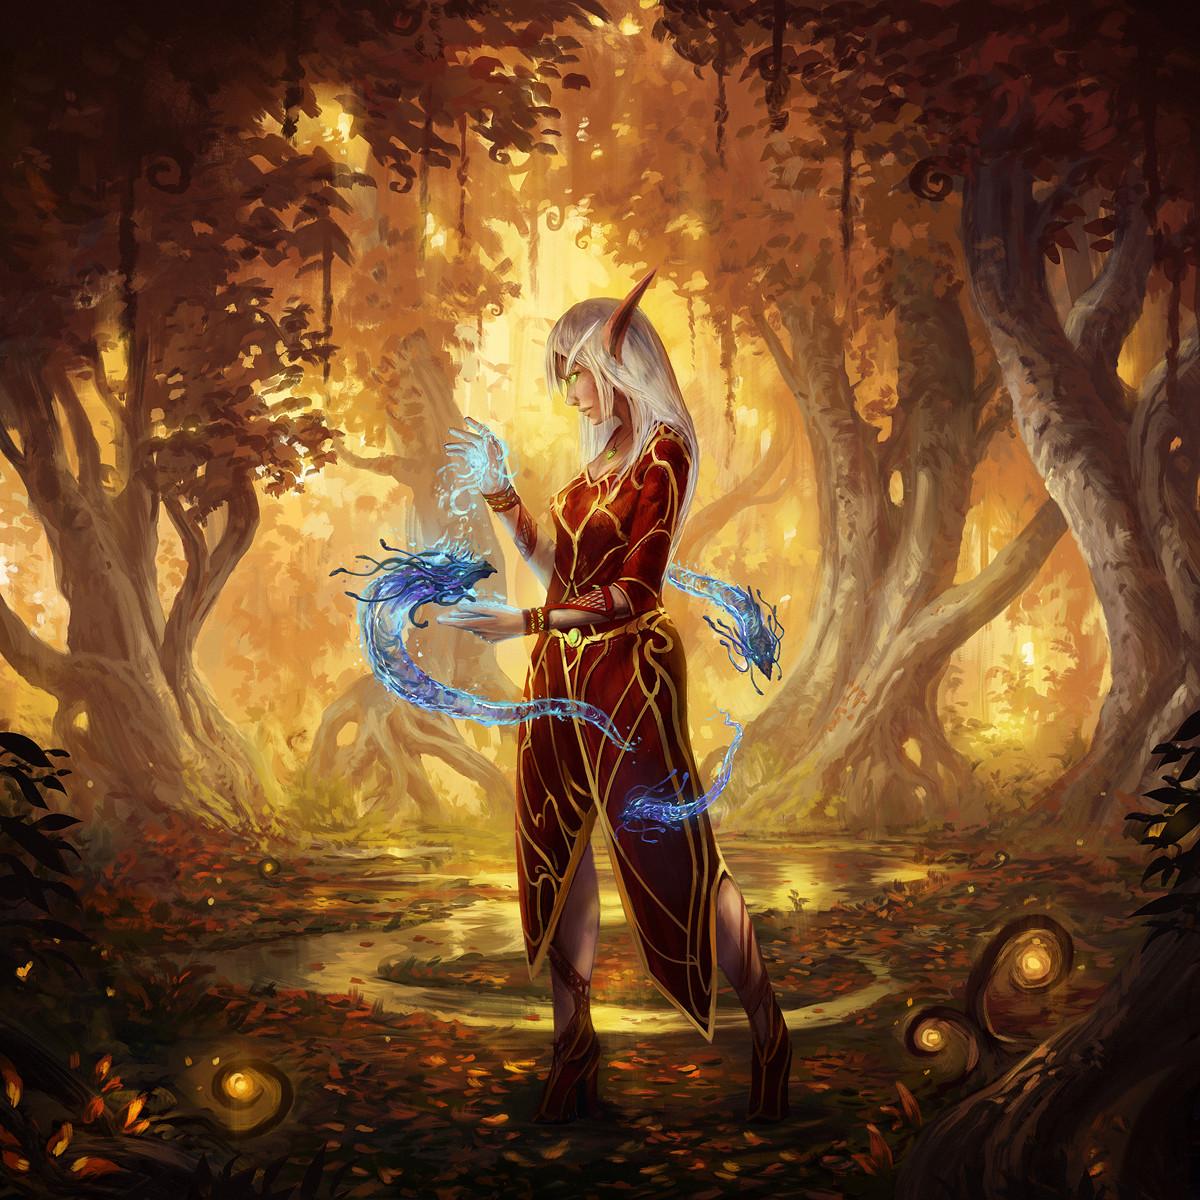 jorge-jacinto-wow-blood-elf-female-final-red.jpg